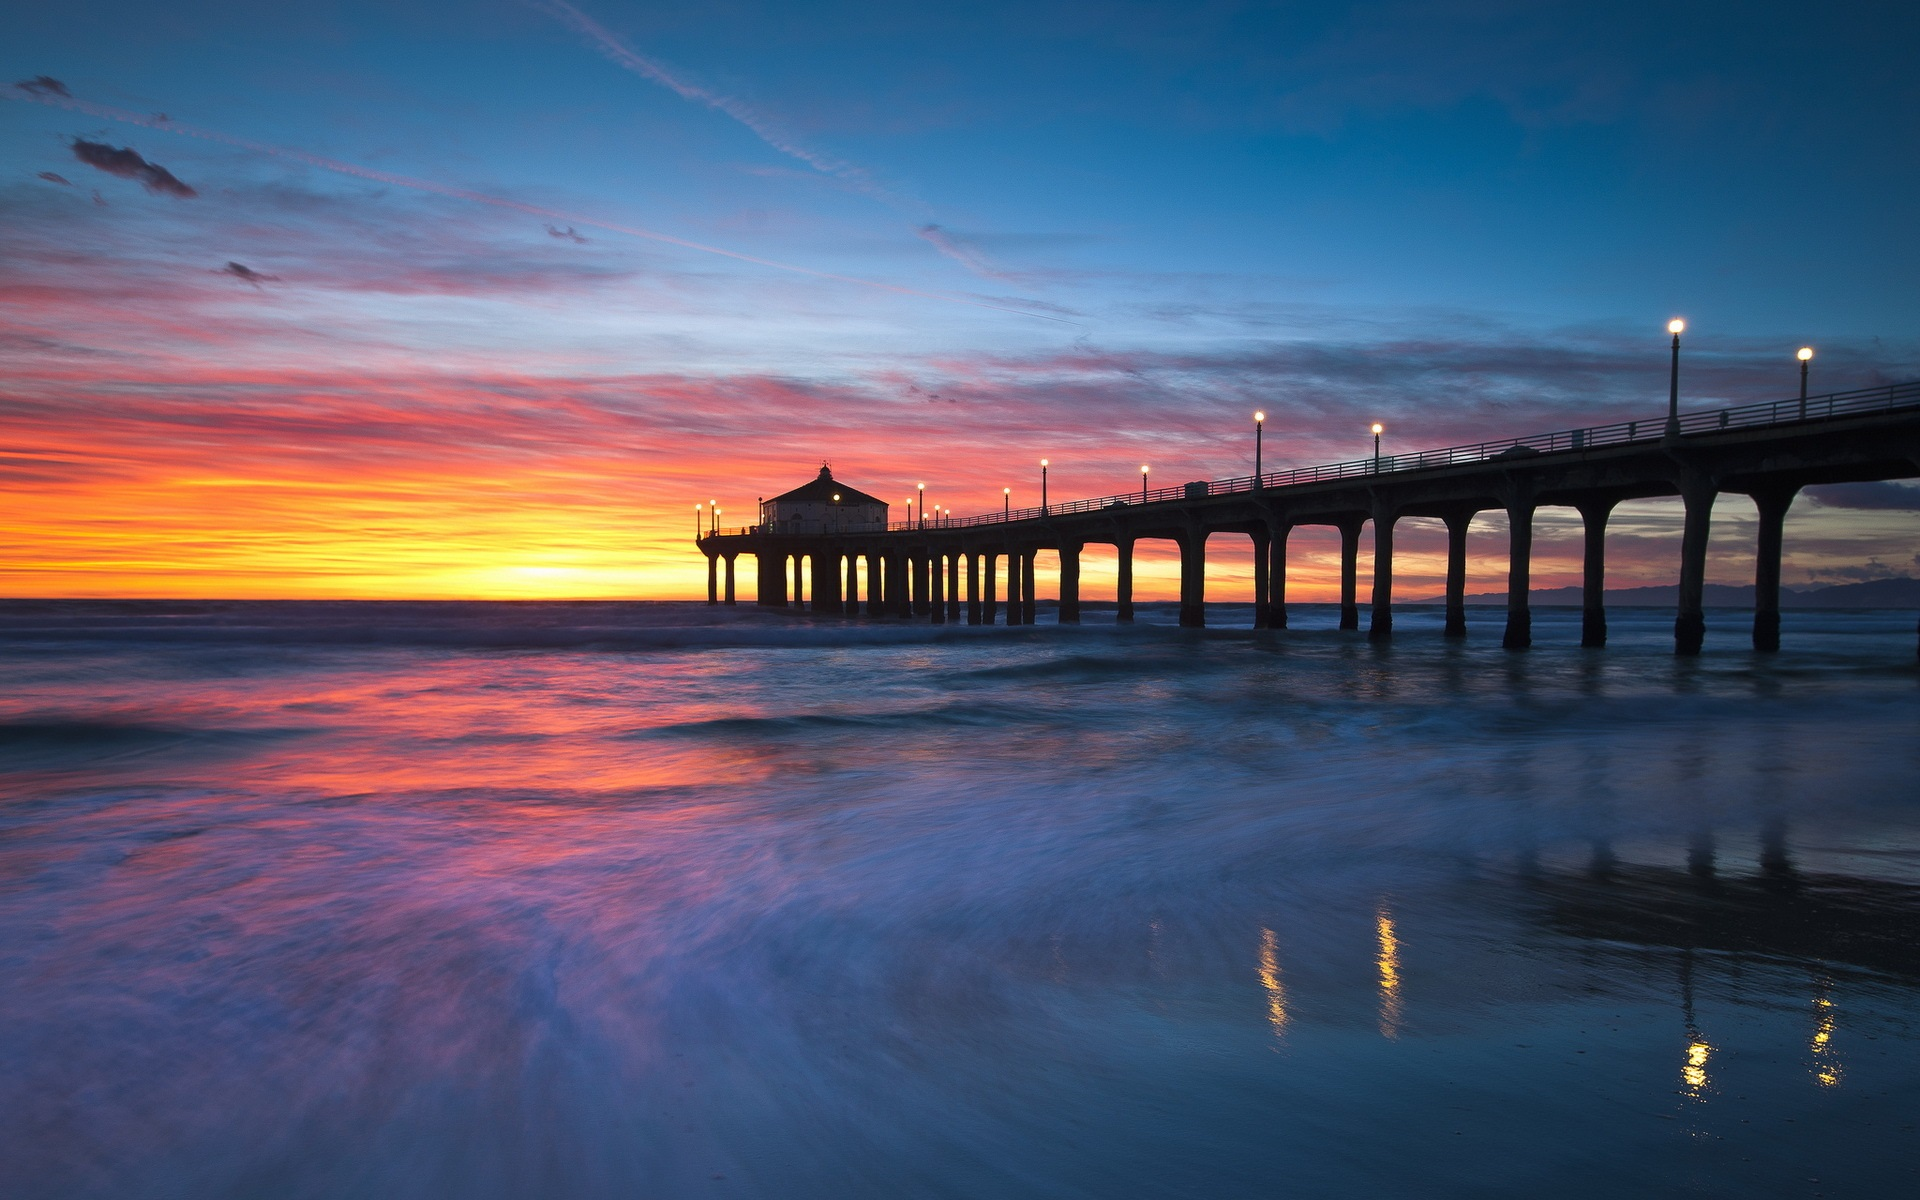 Sunset Beach (CA) United States  city photos : 米国、カリフォルニア州、マンハッタンビーチ ...